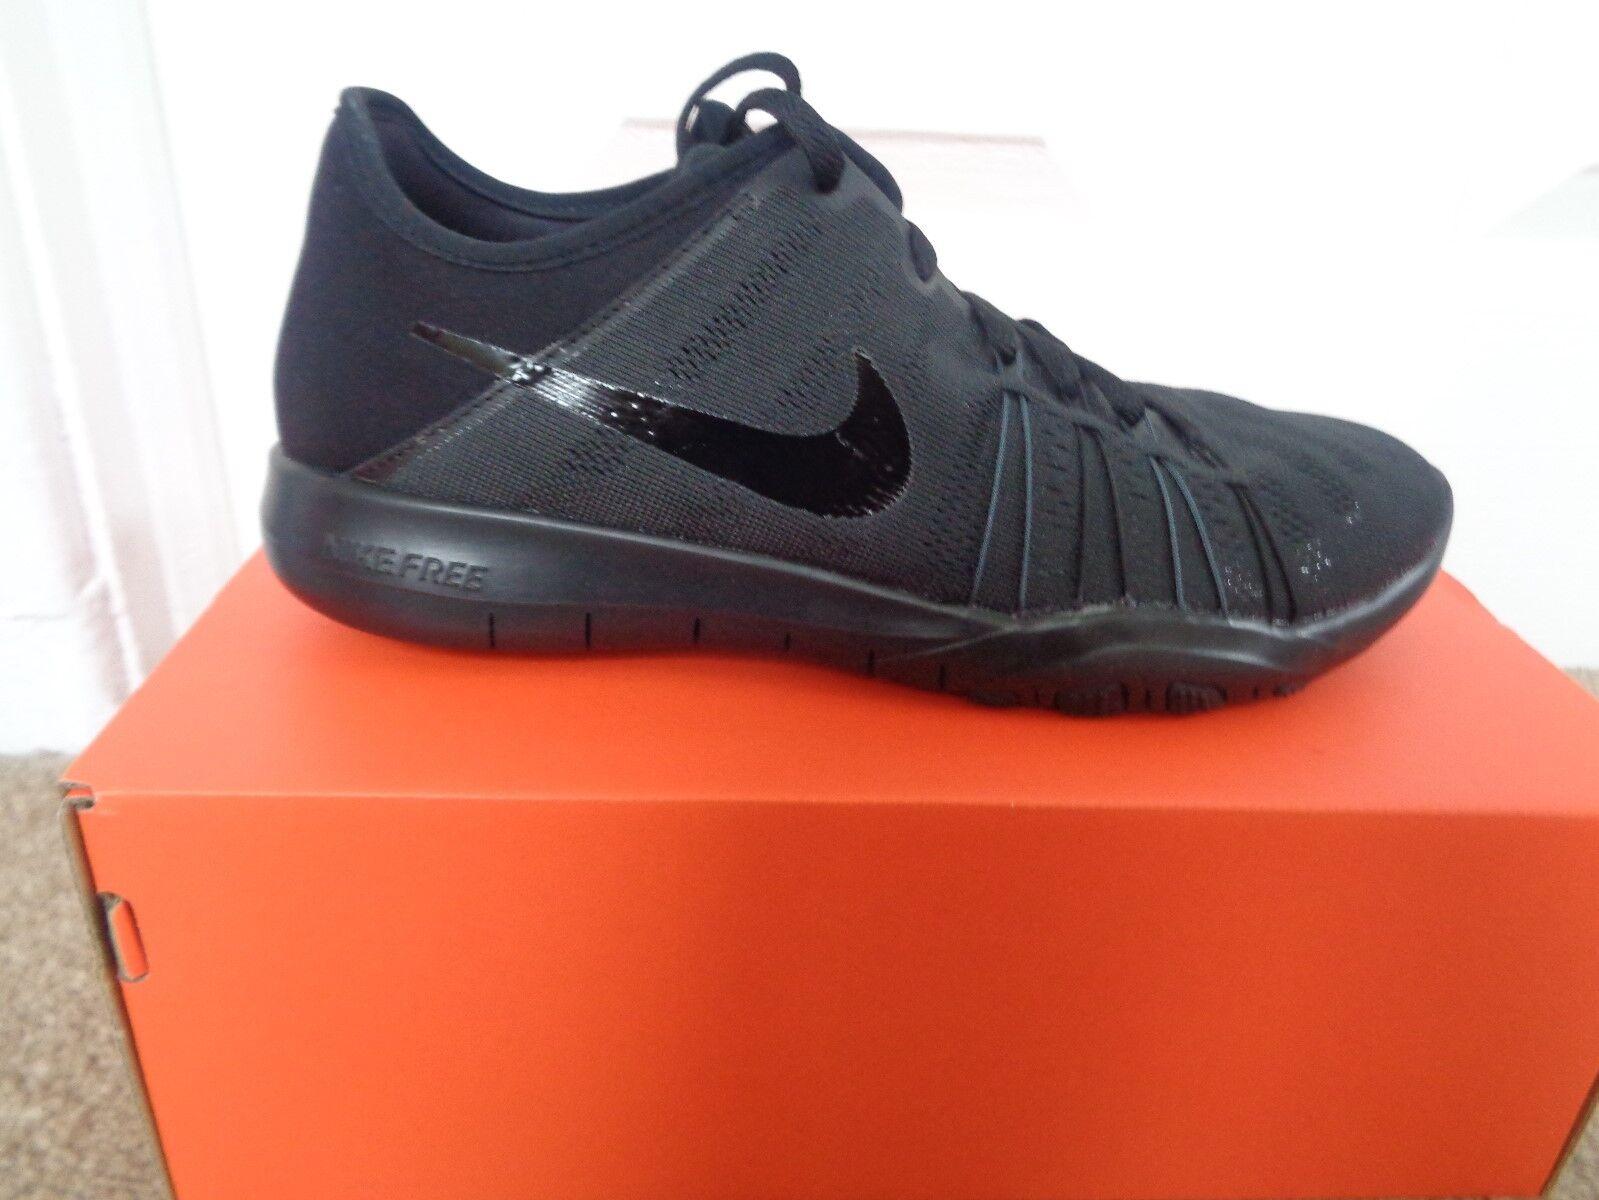 Nike Free Free Nike 5.0 TR 6 Mujeres Zapatillas Zapatos 833413 002 nos 8 Nuevo + Caja 5e4c71